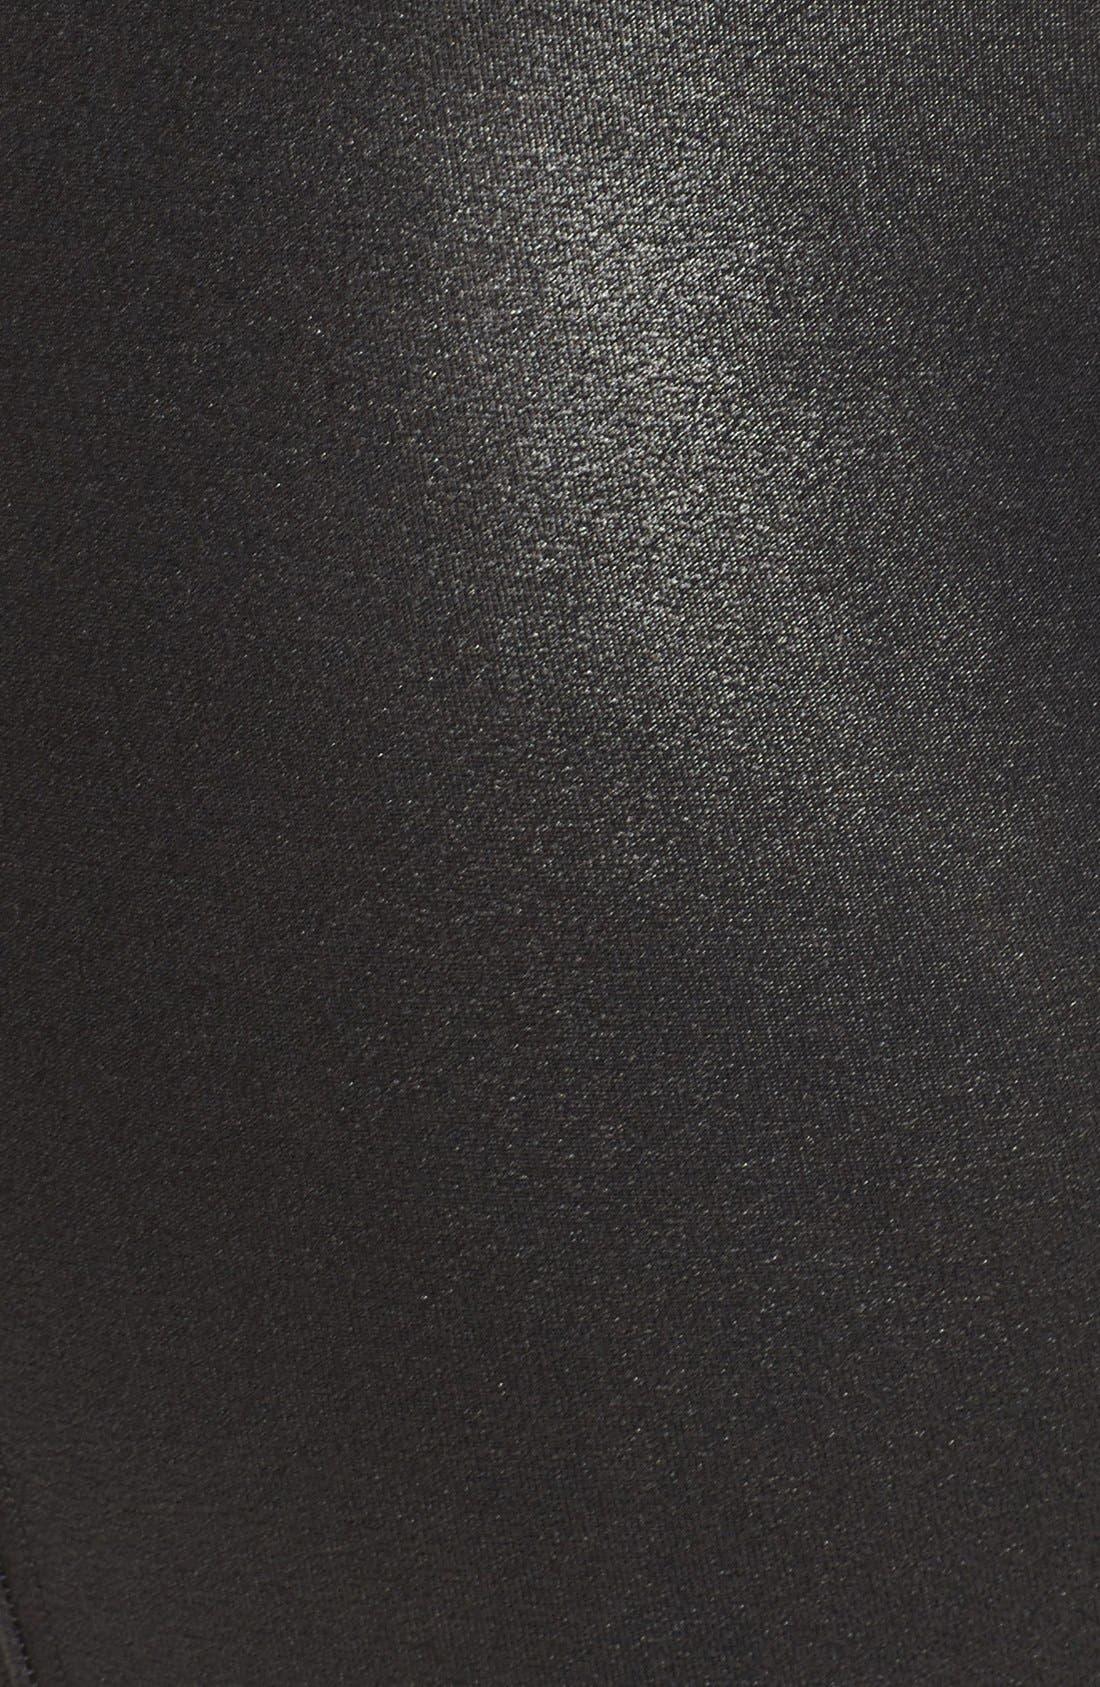 Faux Leather Leggings,                             Alternate thumbnail 9, color,                             BLACK